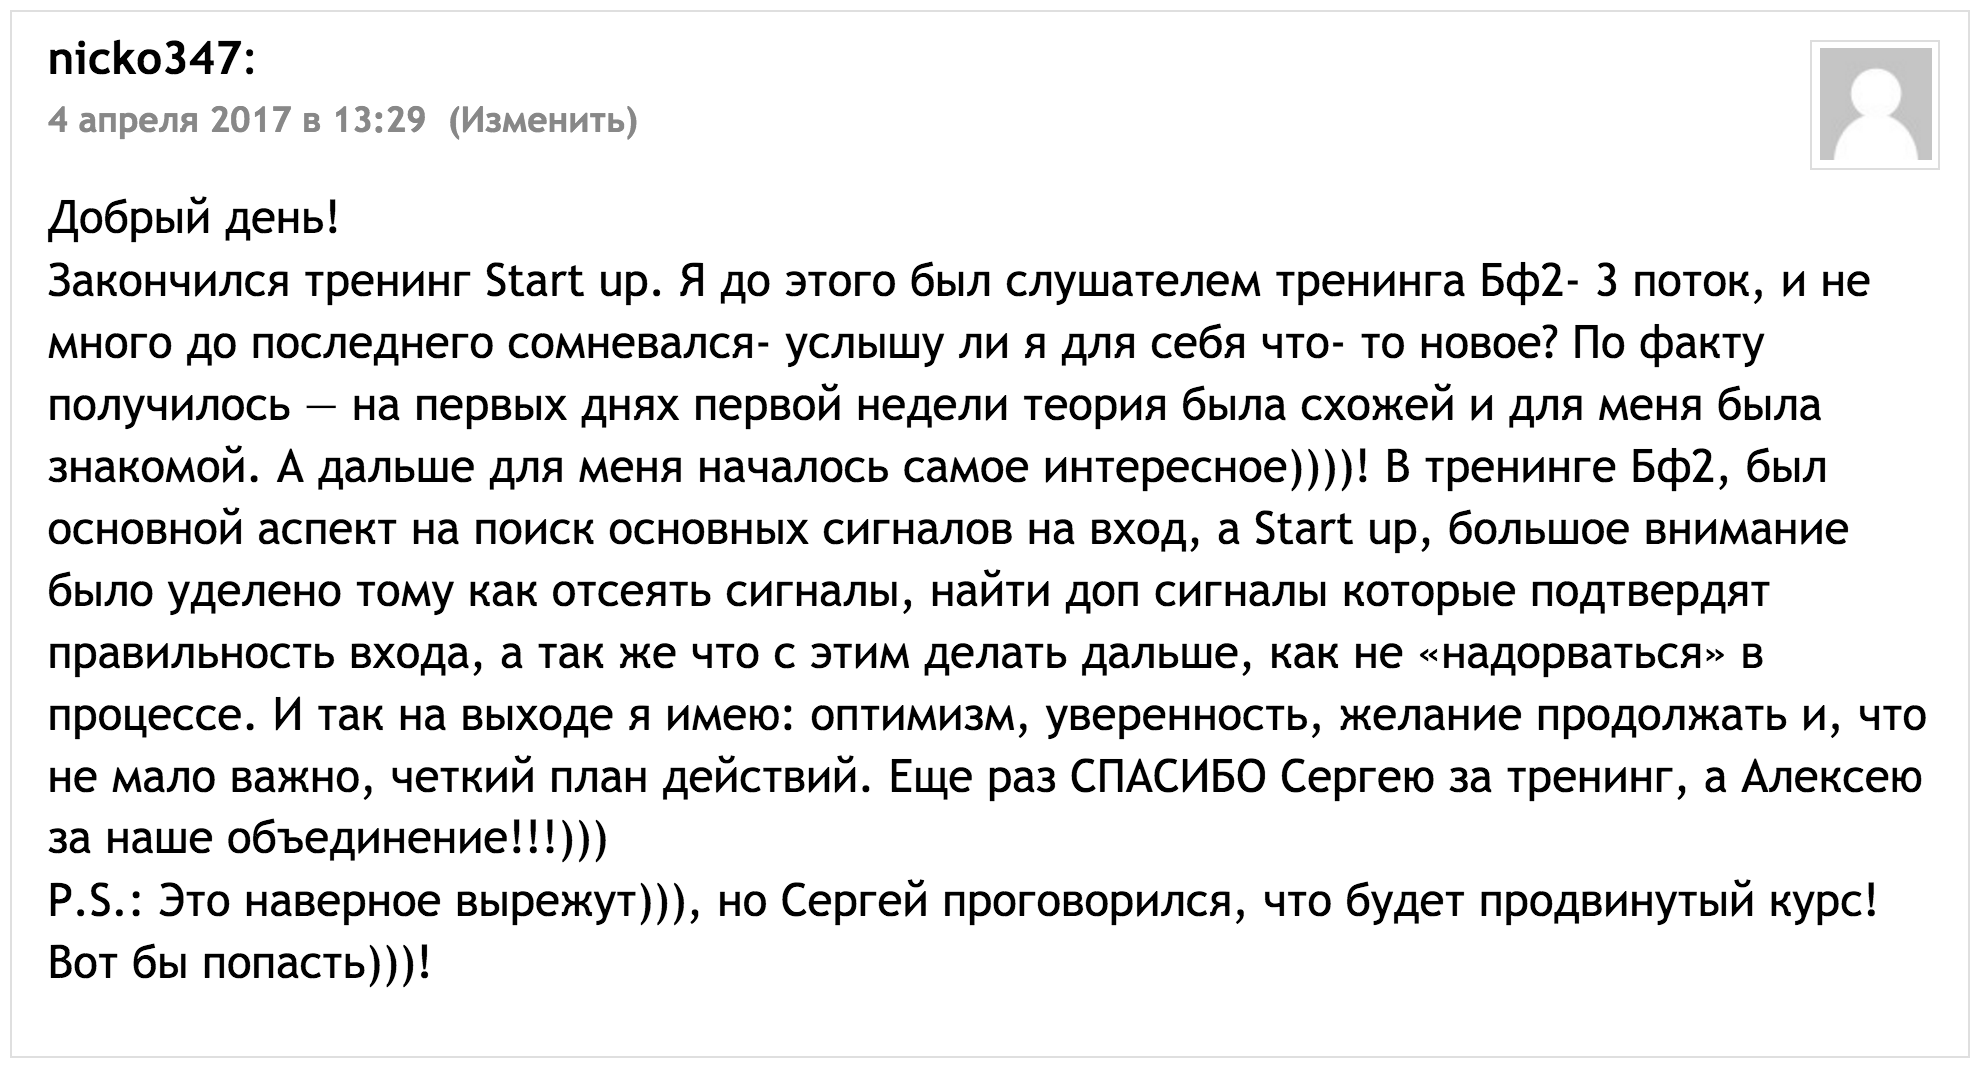 Запись тренинга SF Start Up / SF Start Up 2.0